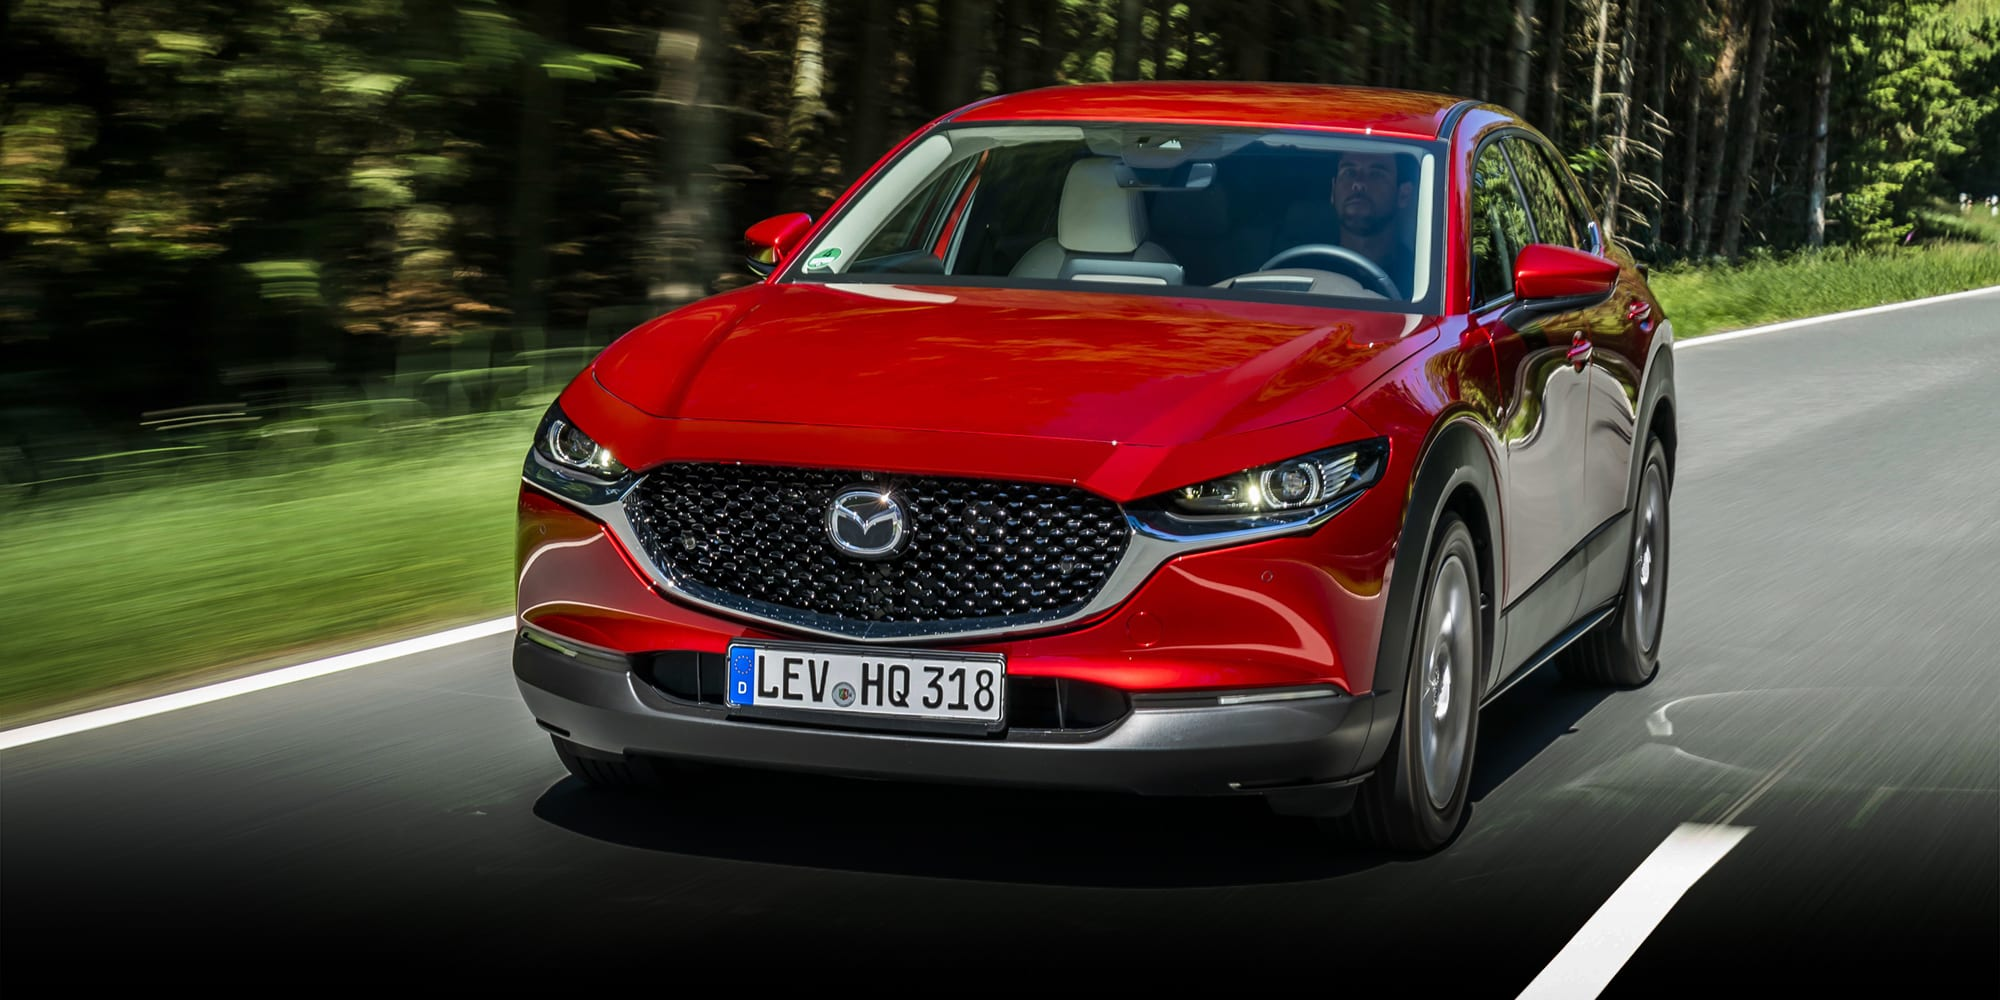 2020 Mazda CX-30 Price, Pics, Redesign, And Release Date >> 2020 Mazda Cx 30 Review Caradvice